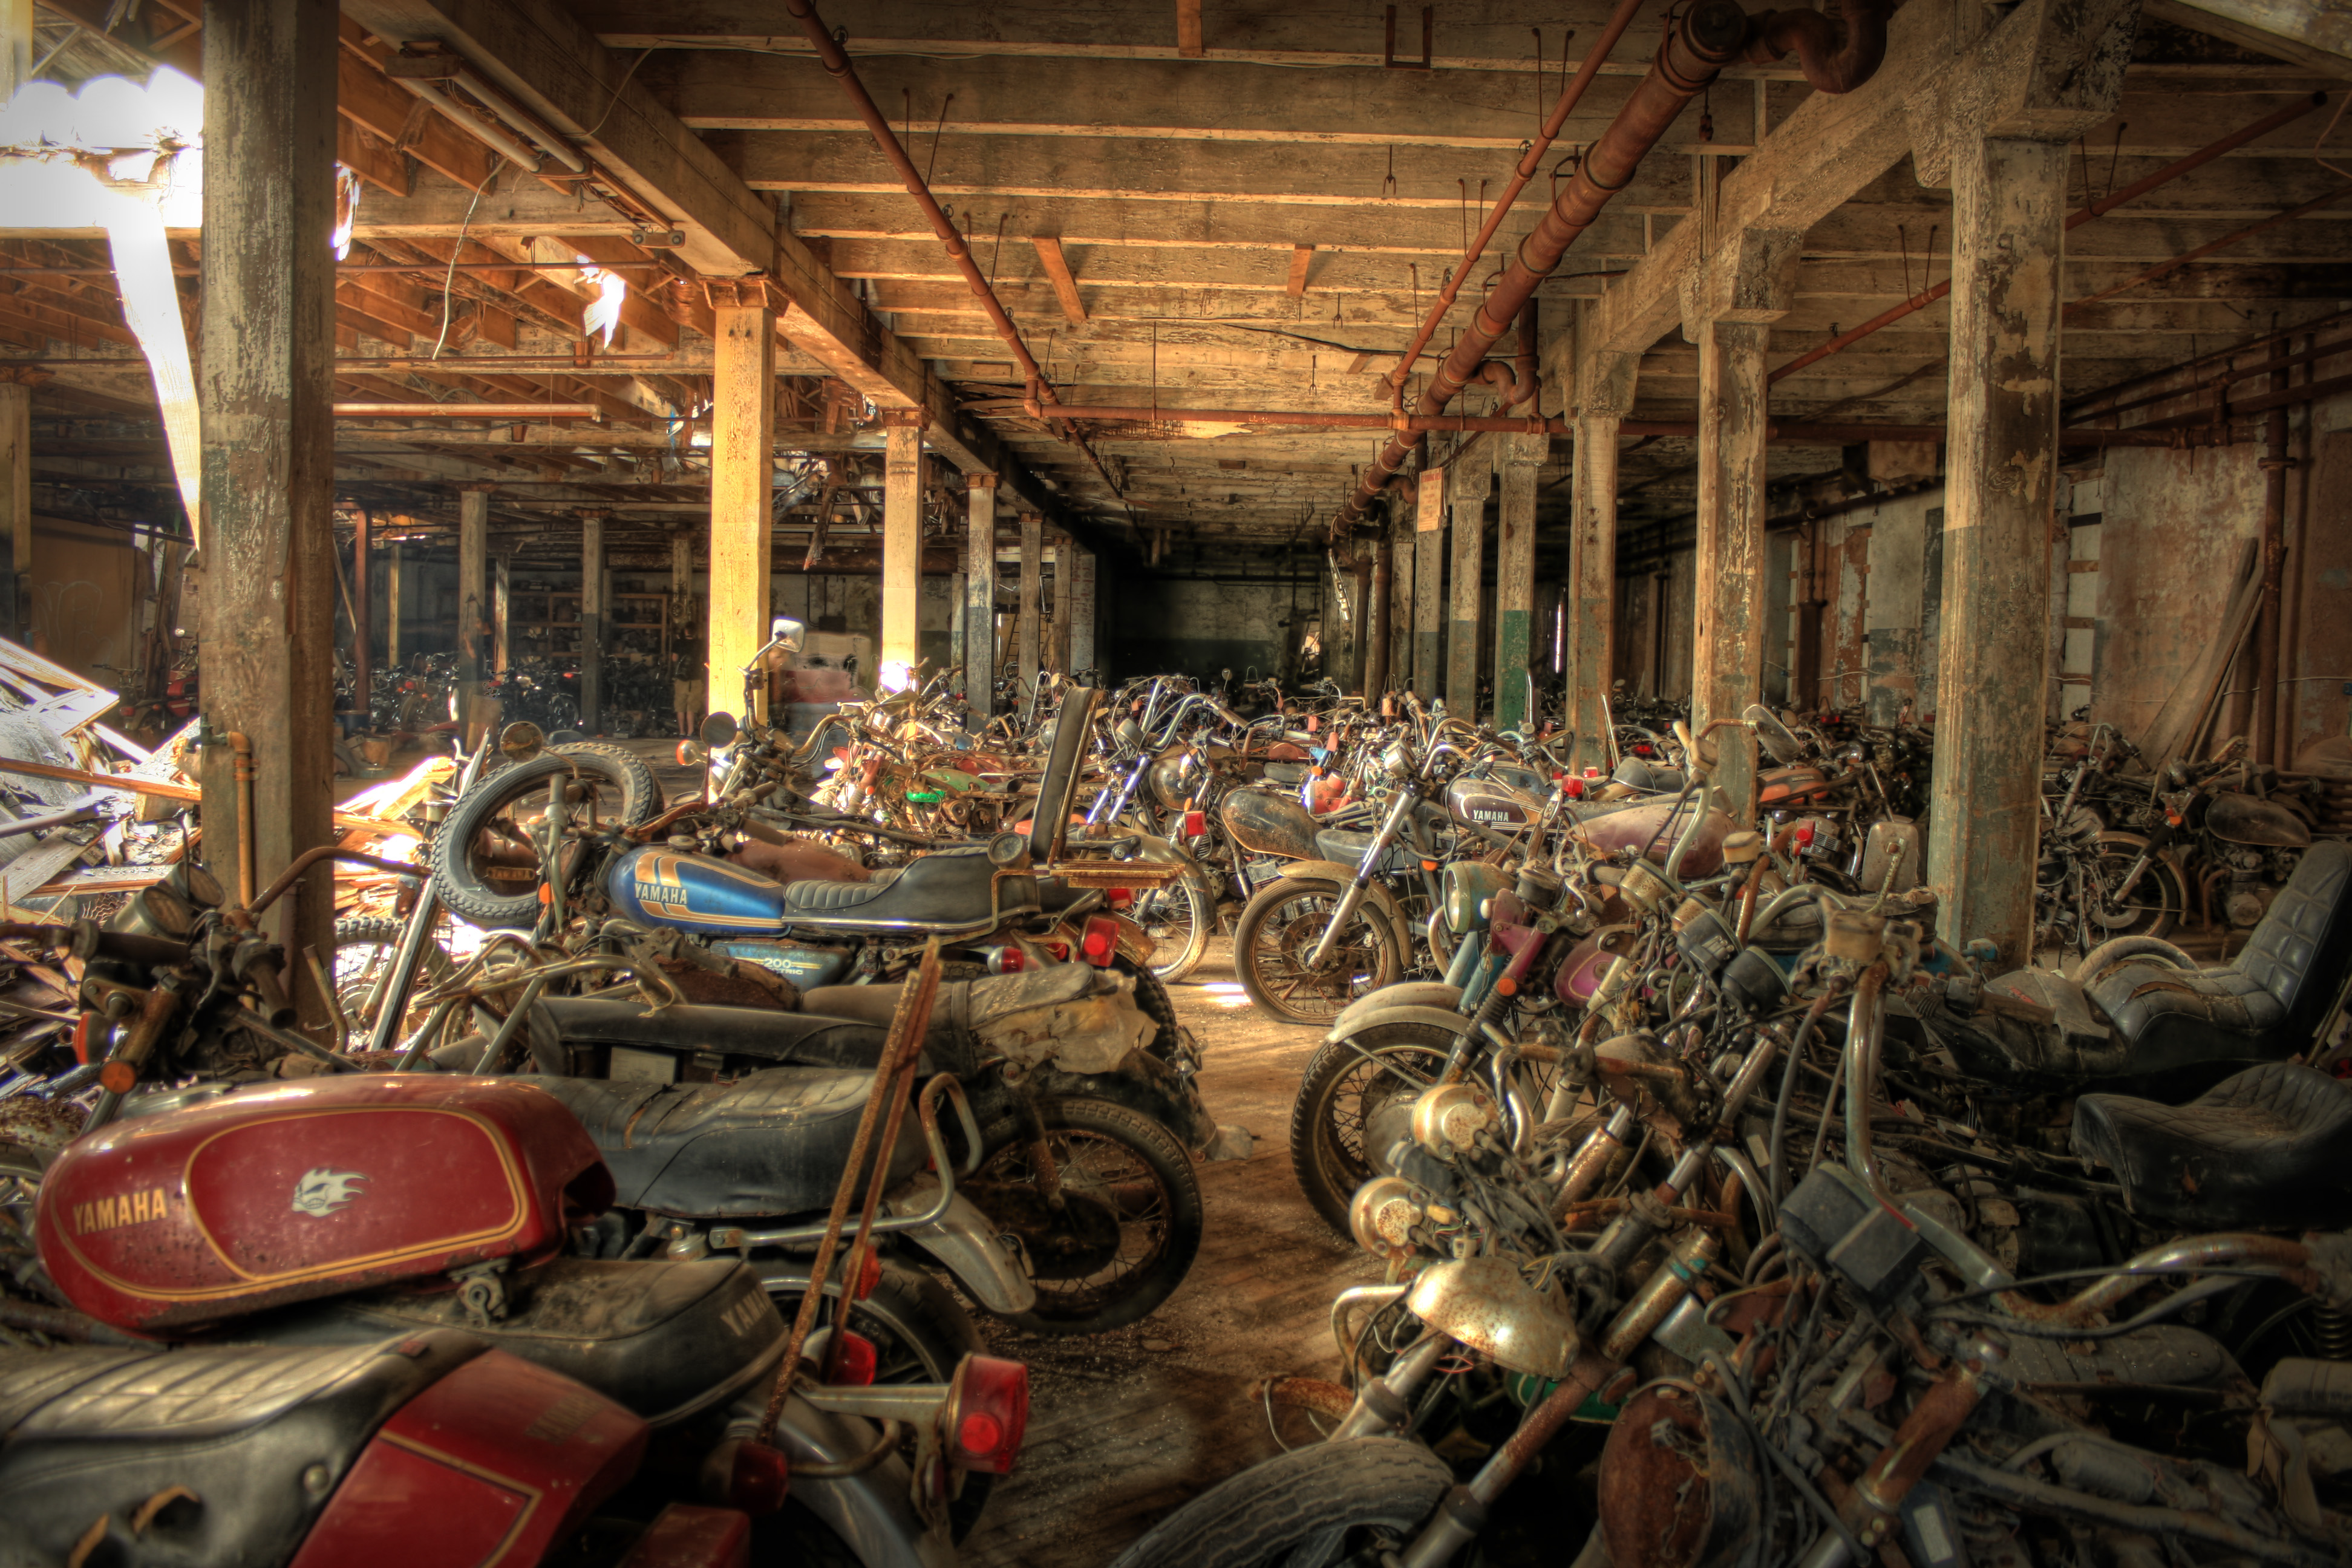 Motorcycle Graveyard Hdr Flickr Photo Sharing